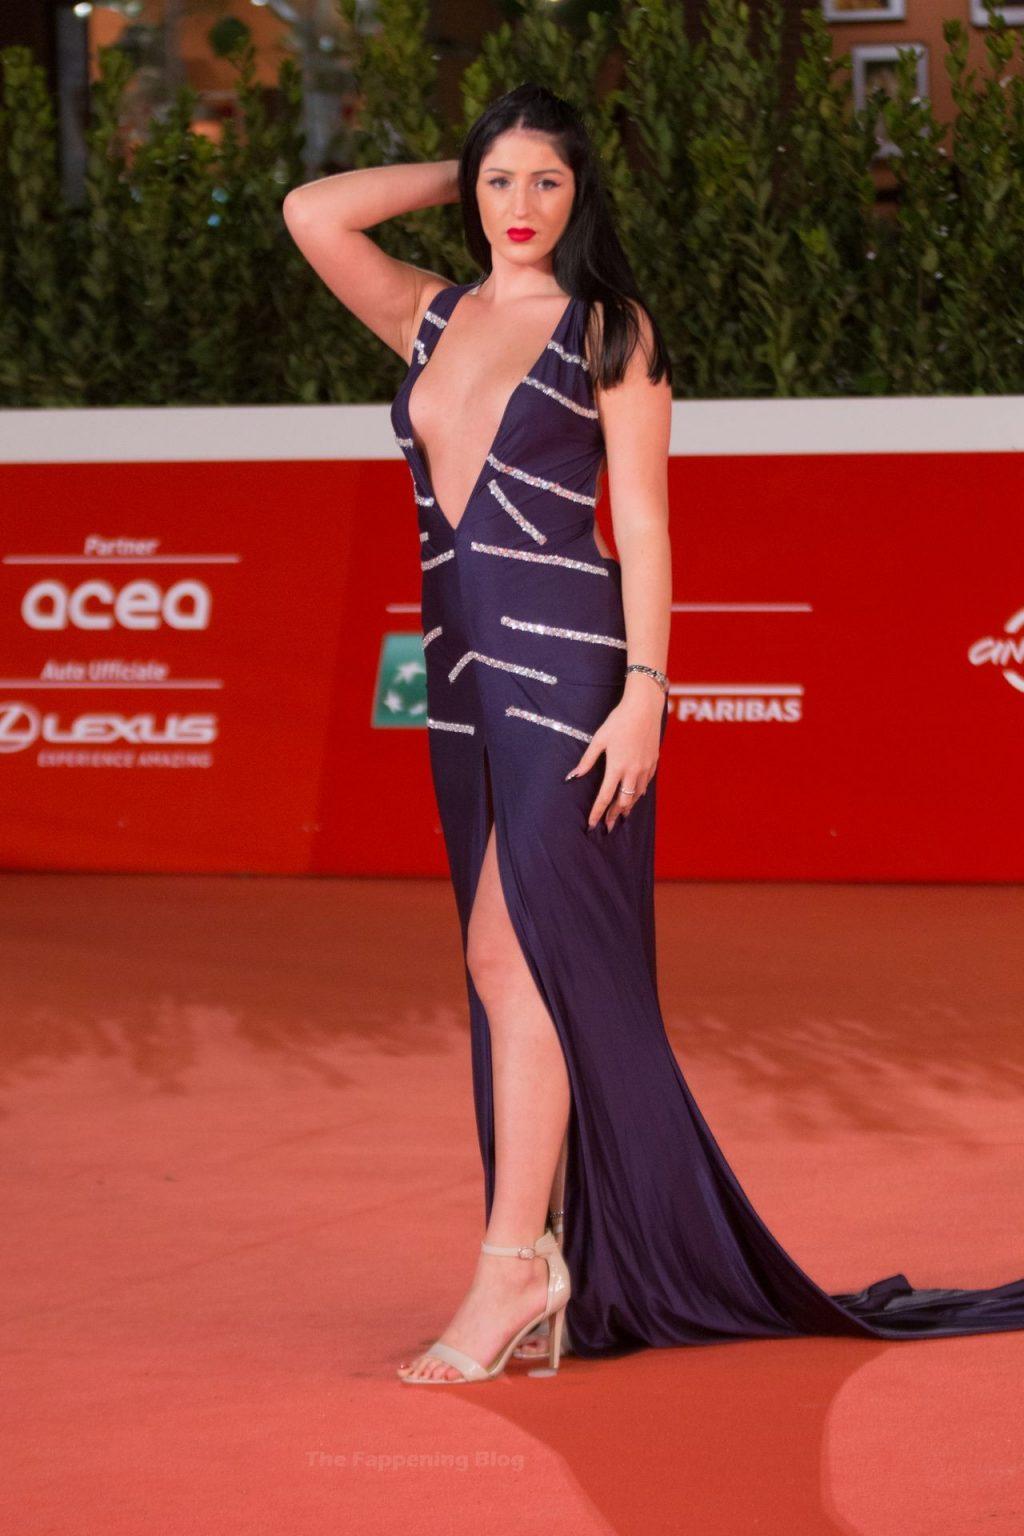 Veronica Panzera Displays Her Deep Cleavage in Rome (7 Photos)